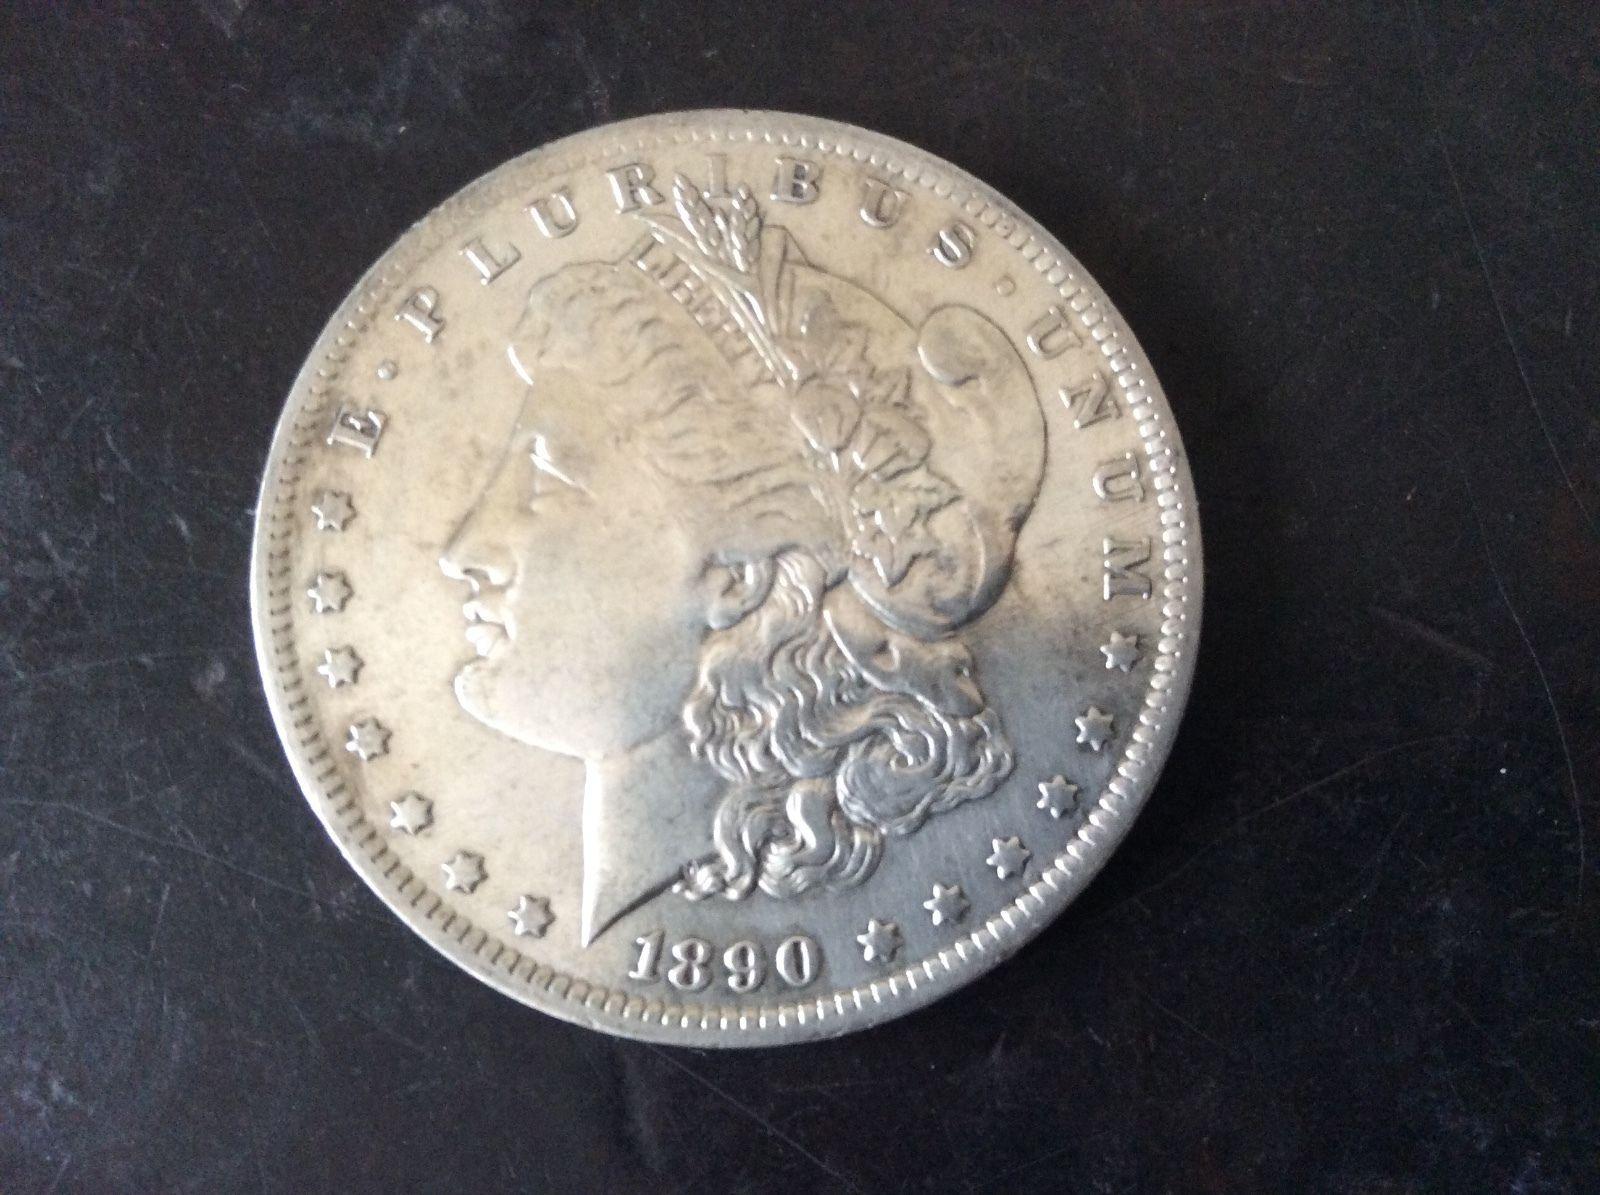 1890-O $1 Morgan Silver Dollar https://t.co/HrpGXOXLzf https://t.co/JCb8RgIryj